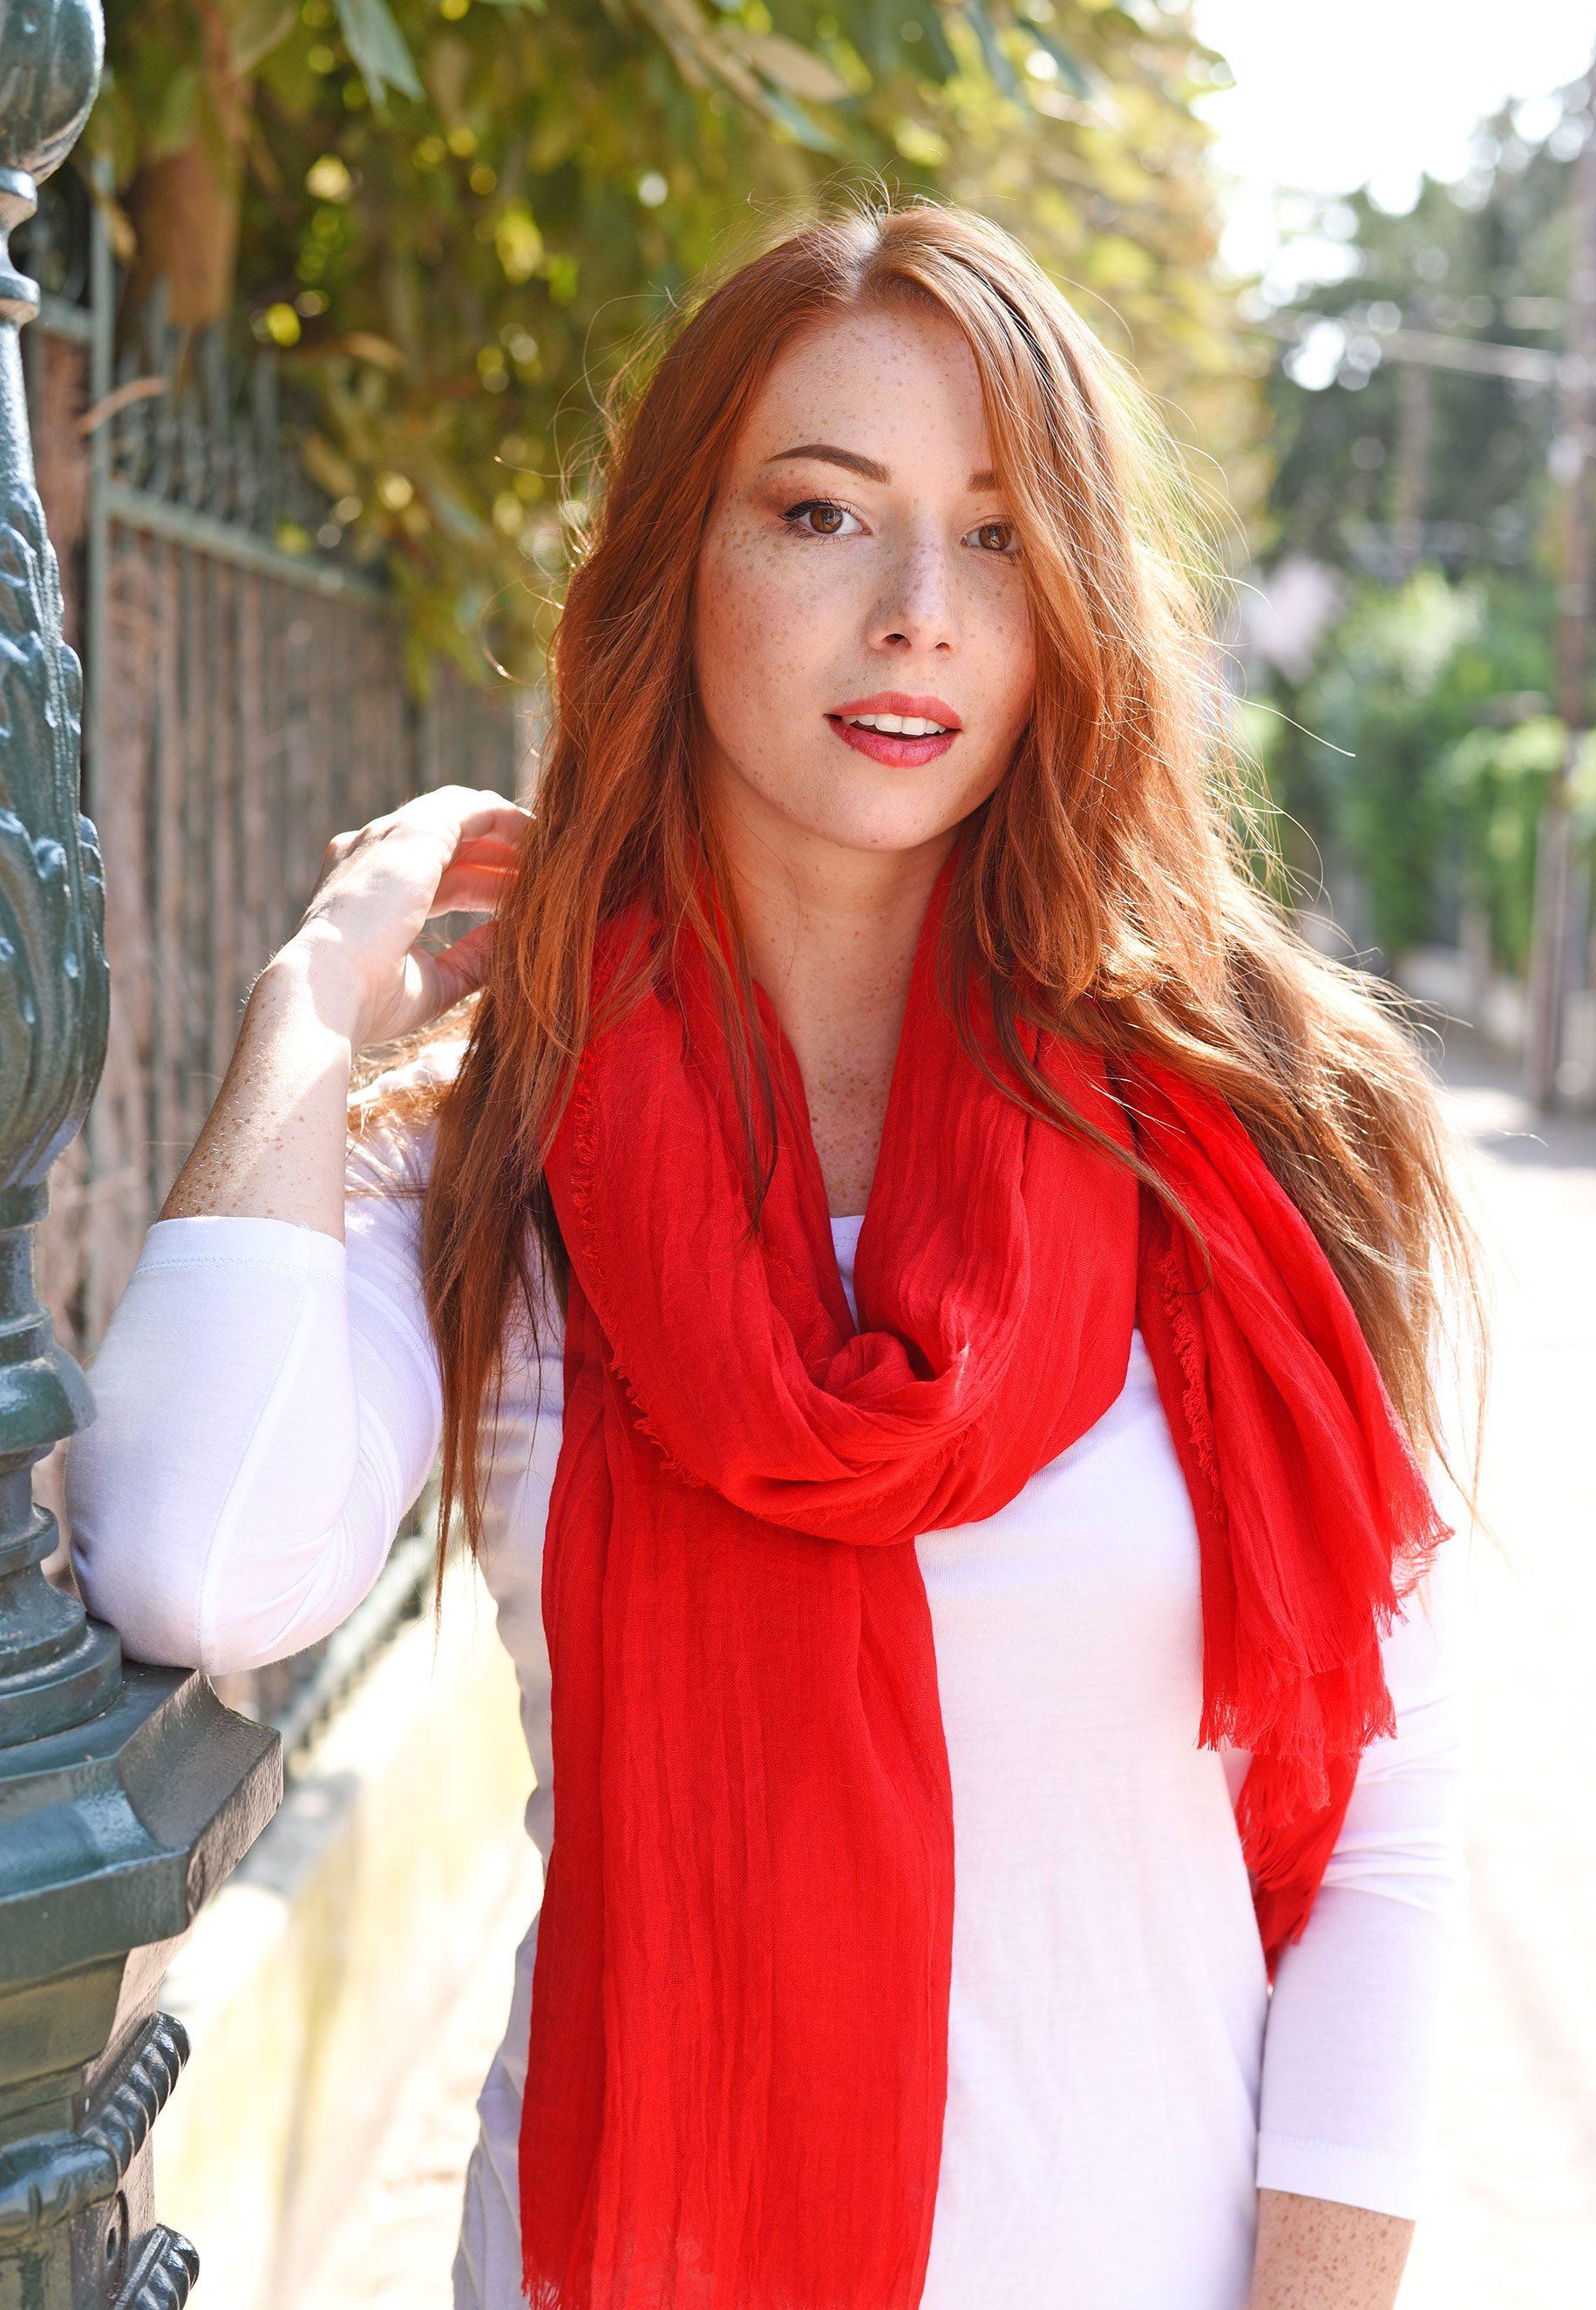 http://lookbook.allee-du-foulard.fr/wp-content/uploads/2018/09/0699-ADF-Accessoires-de-mode-LB-Colorama-automne-cheche_rouge-1831x2650.jpg